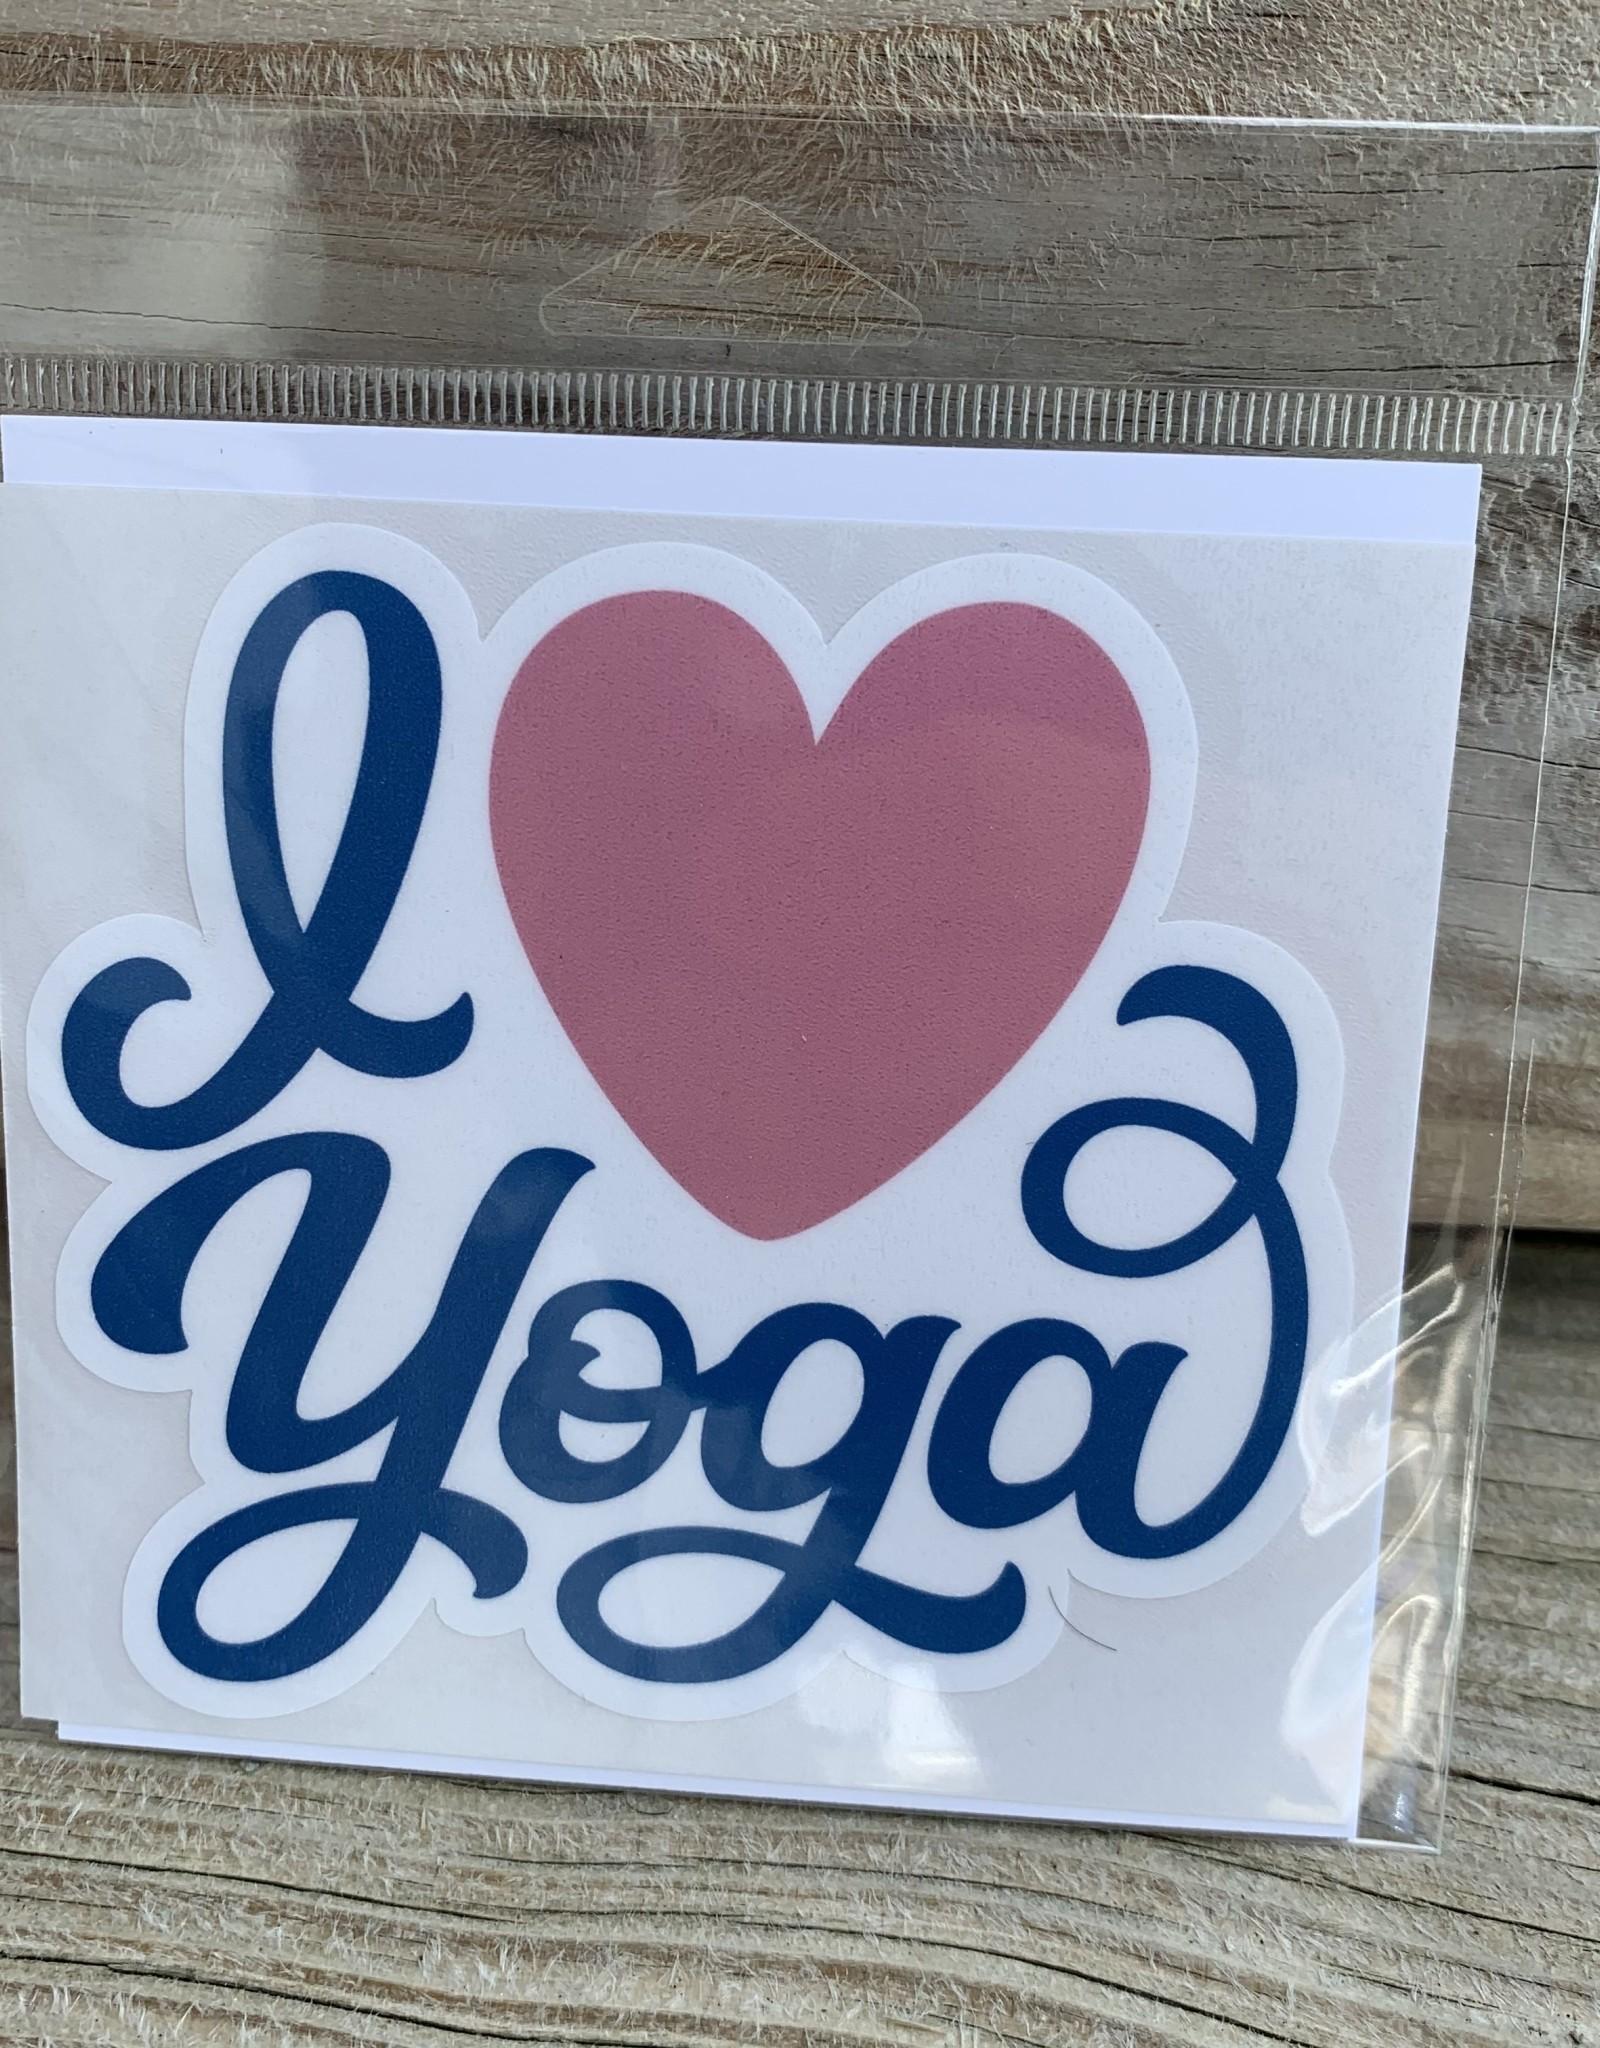 I LOVE YOGA STICKER (LARGE)